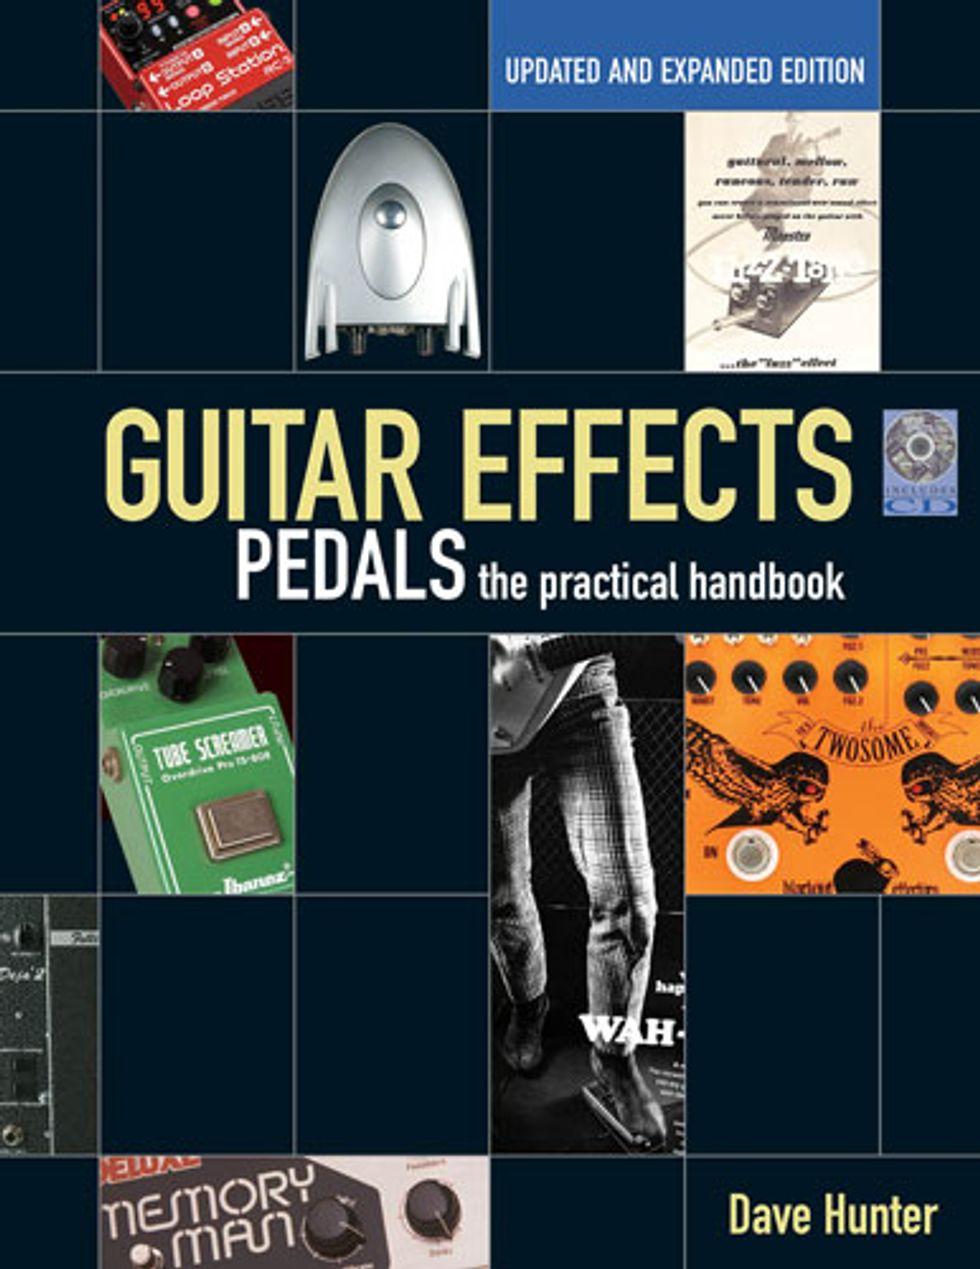 backbeat books to publish guitar effects pedals the practical handbook 2013 12 04 premier. Black Bedroom Furniture Sets. Home Design Ideas